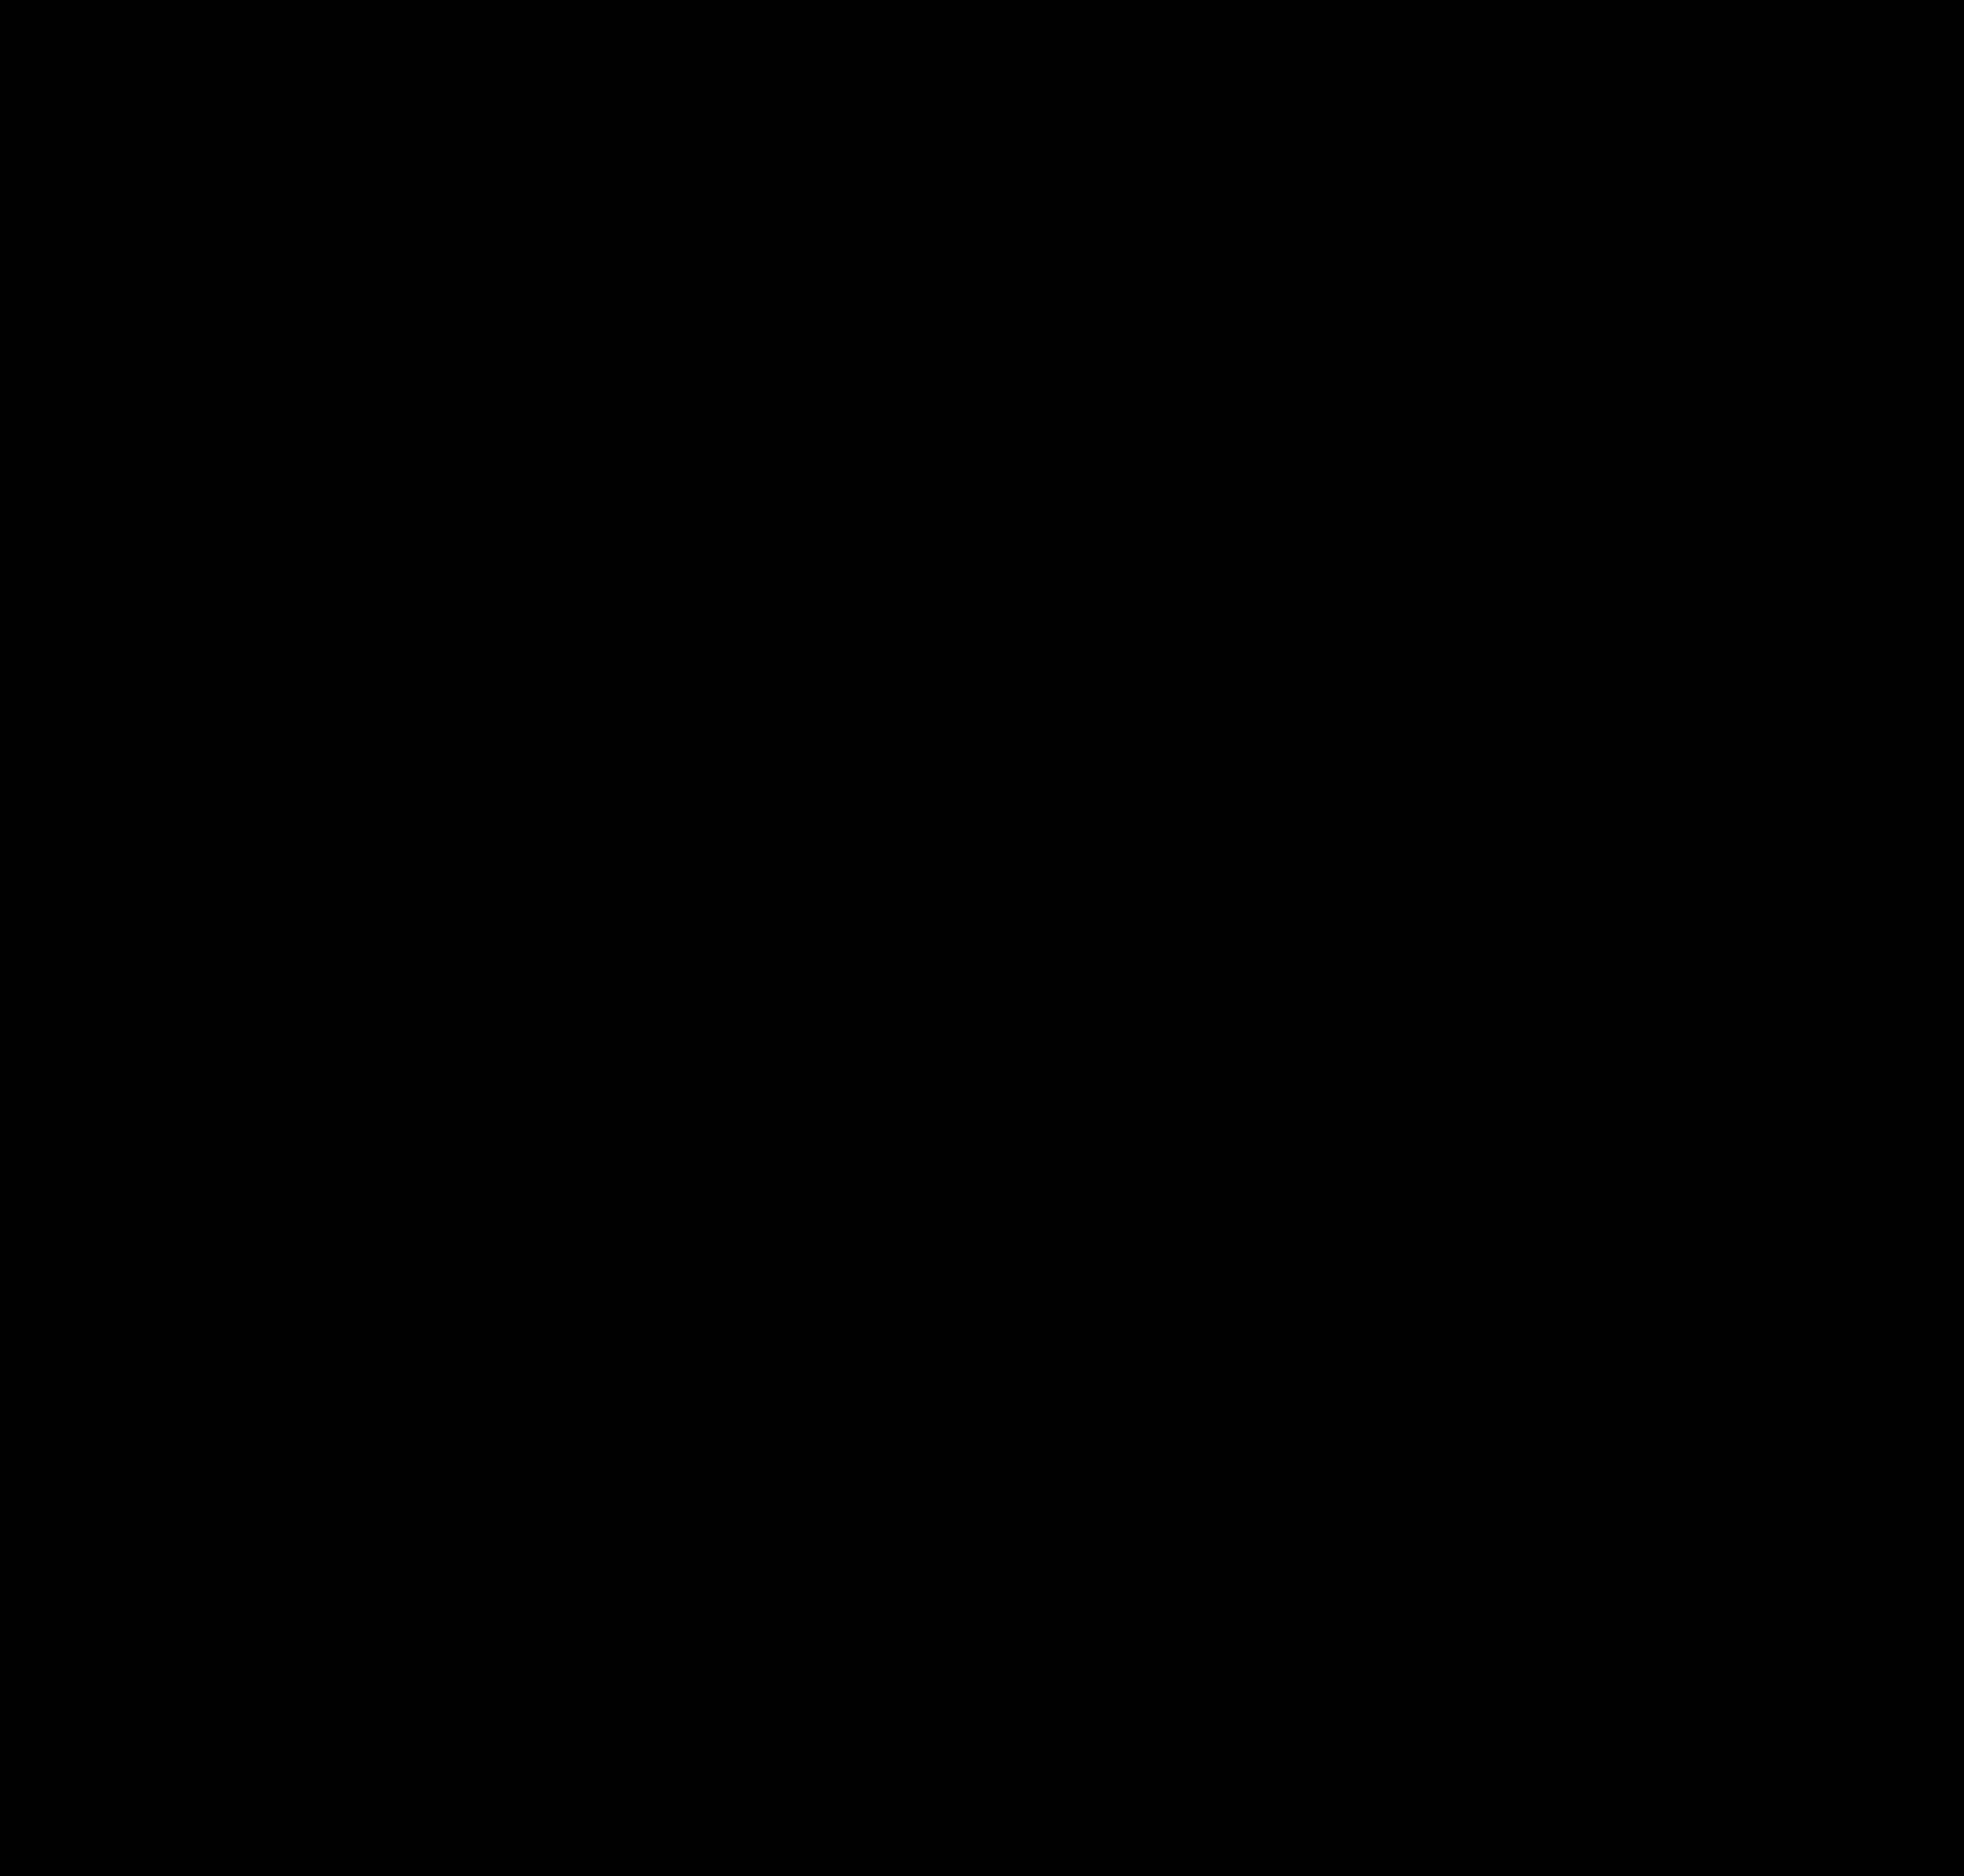 Icone lien linkedIn